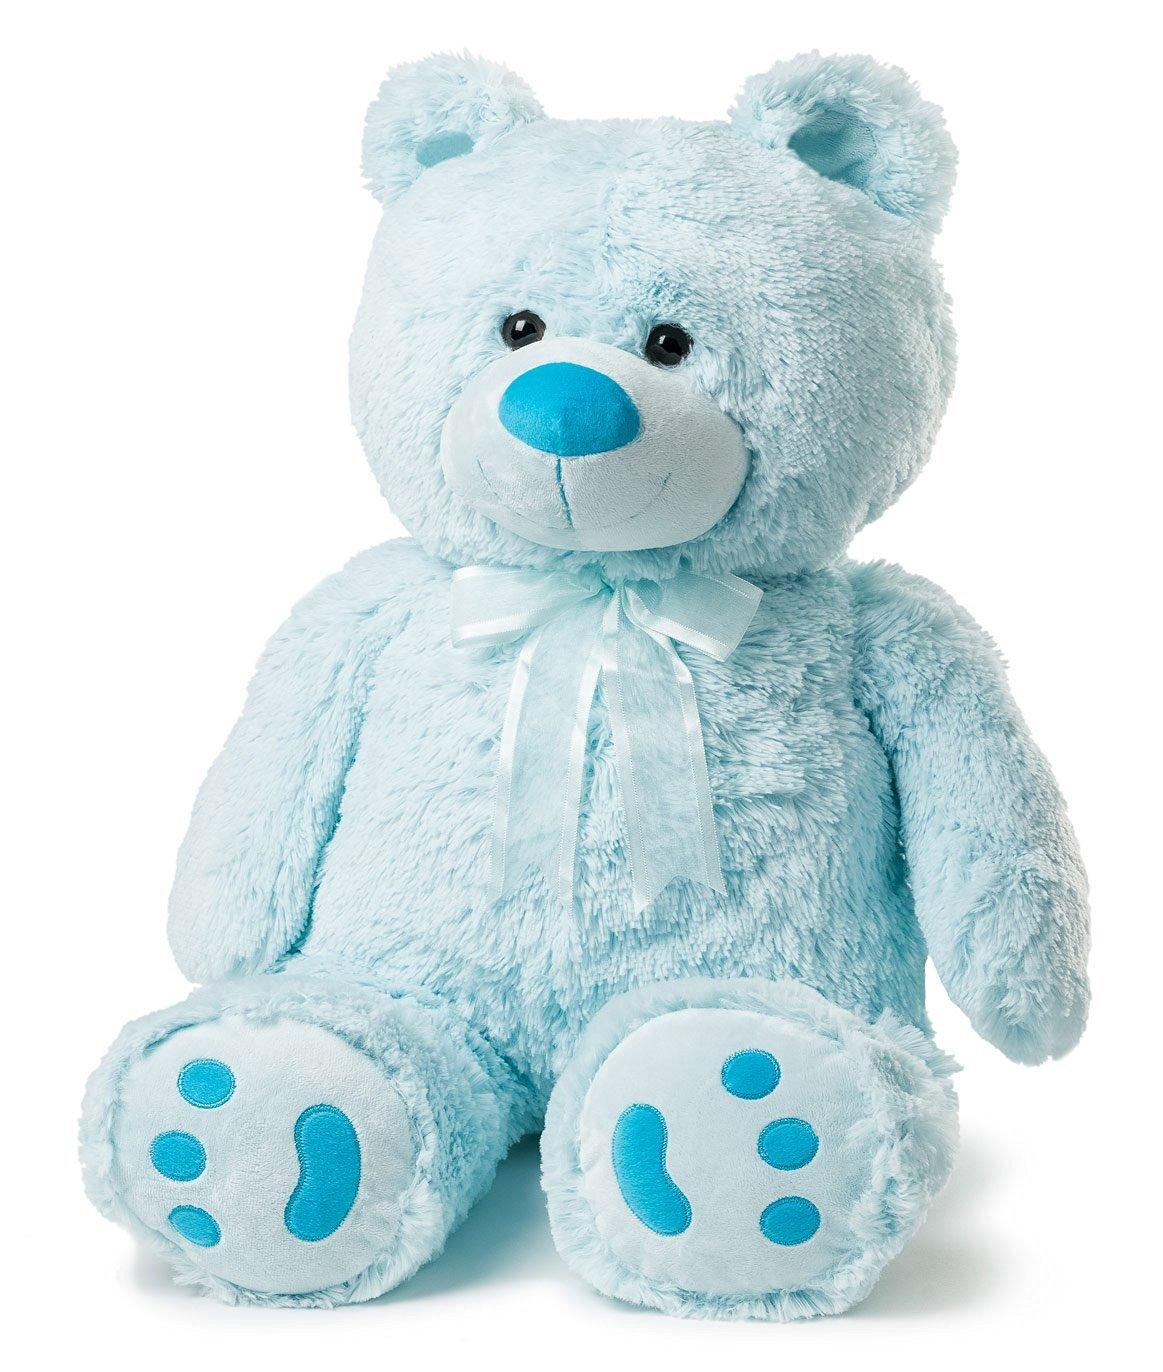 аллергенна, картинки синего медвежонка розу подвешивали